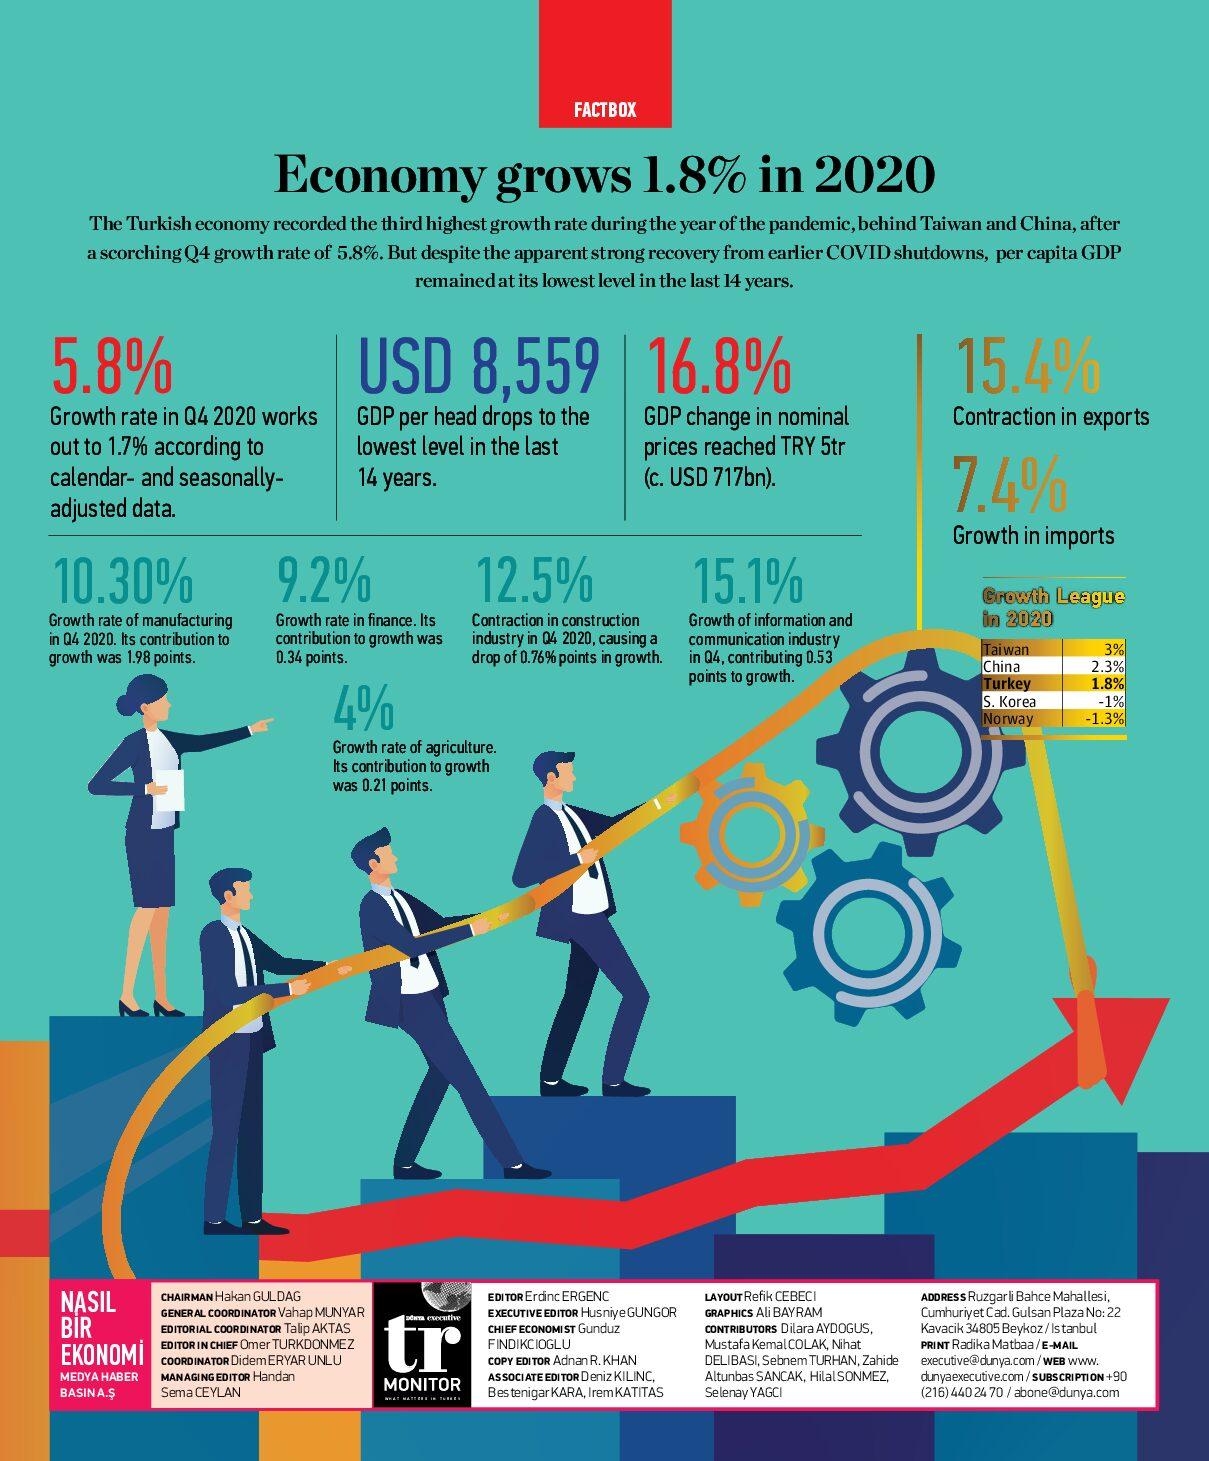 Economy grows 1.8% in 2020